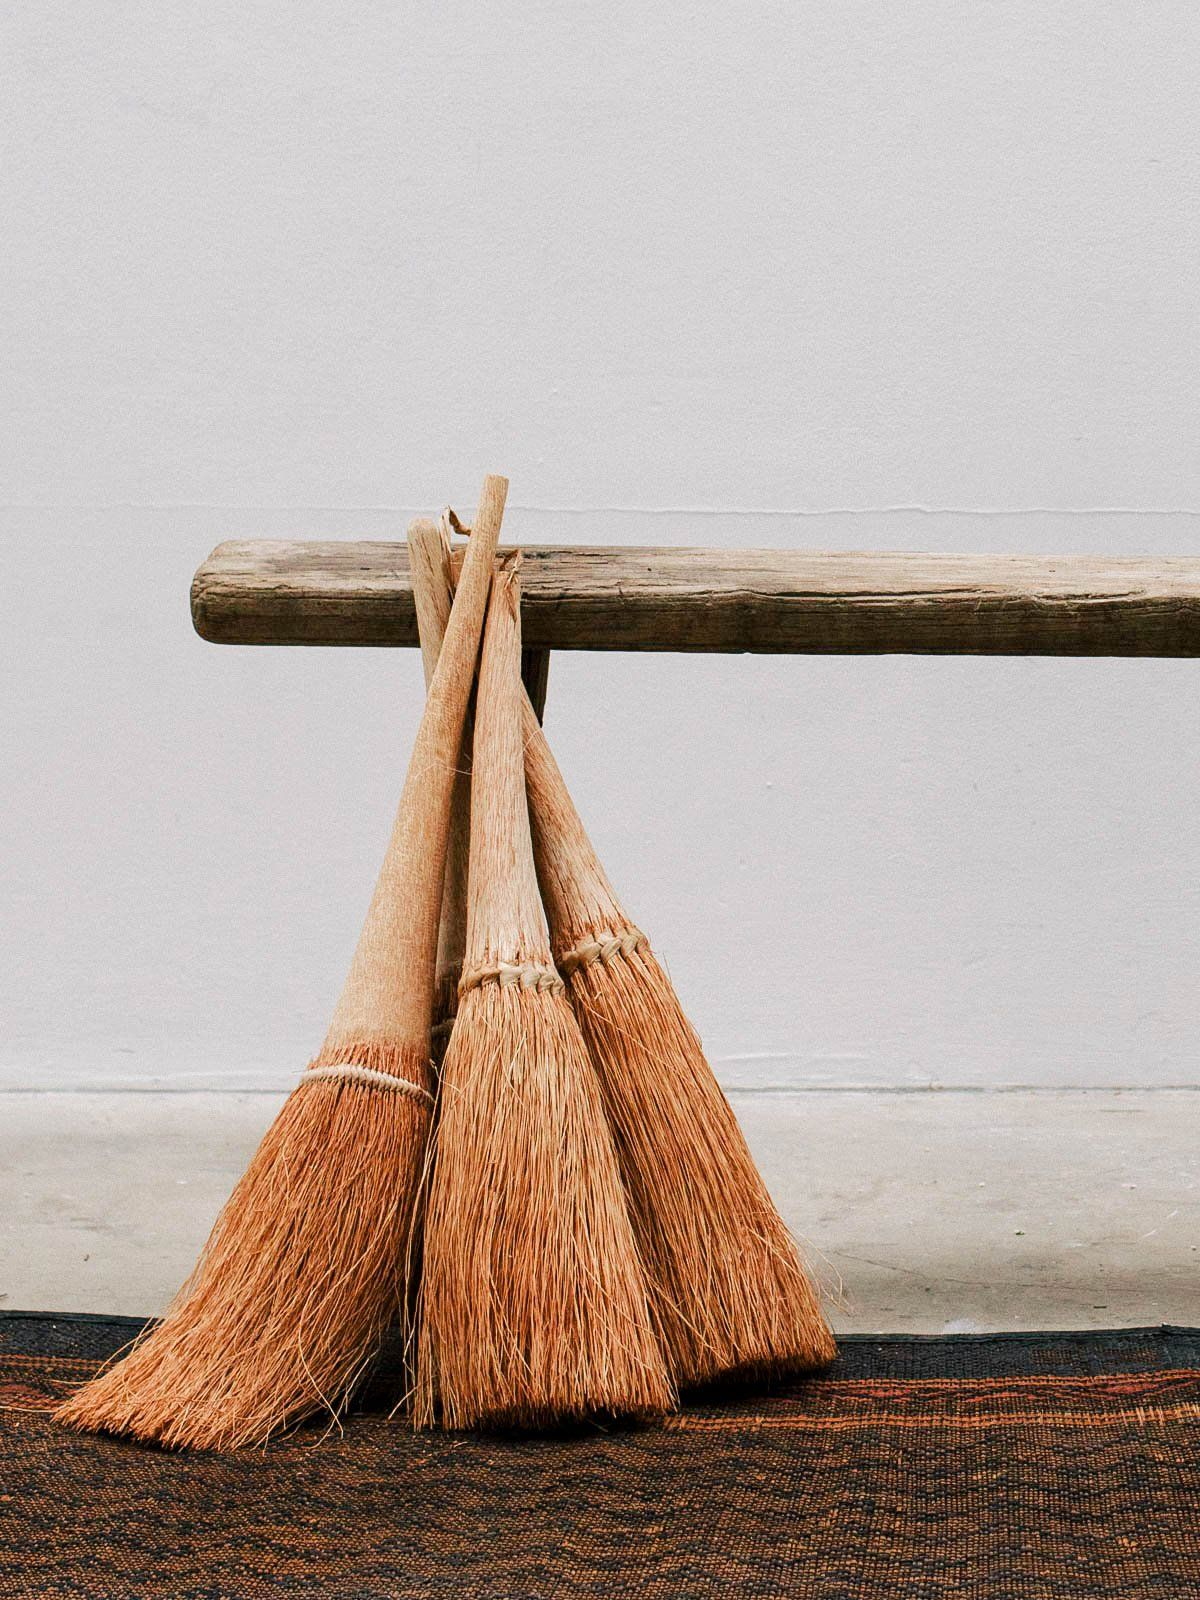 XAÏXAÏ HAND BROOM Plant fibres, Broom, Handmade